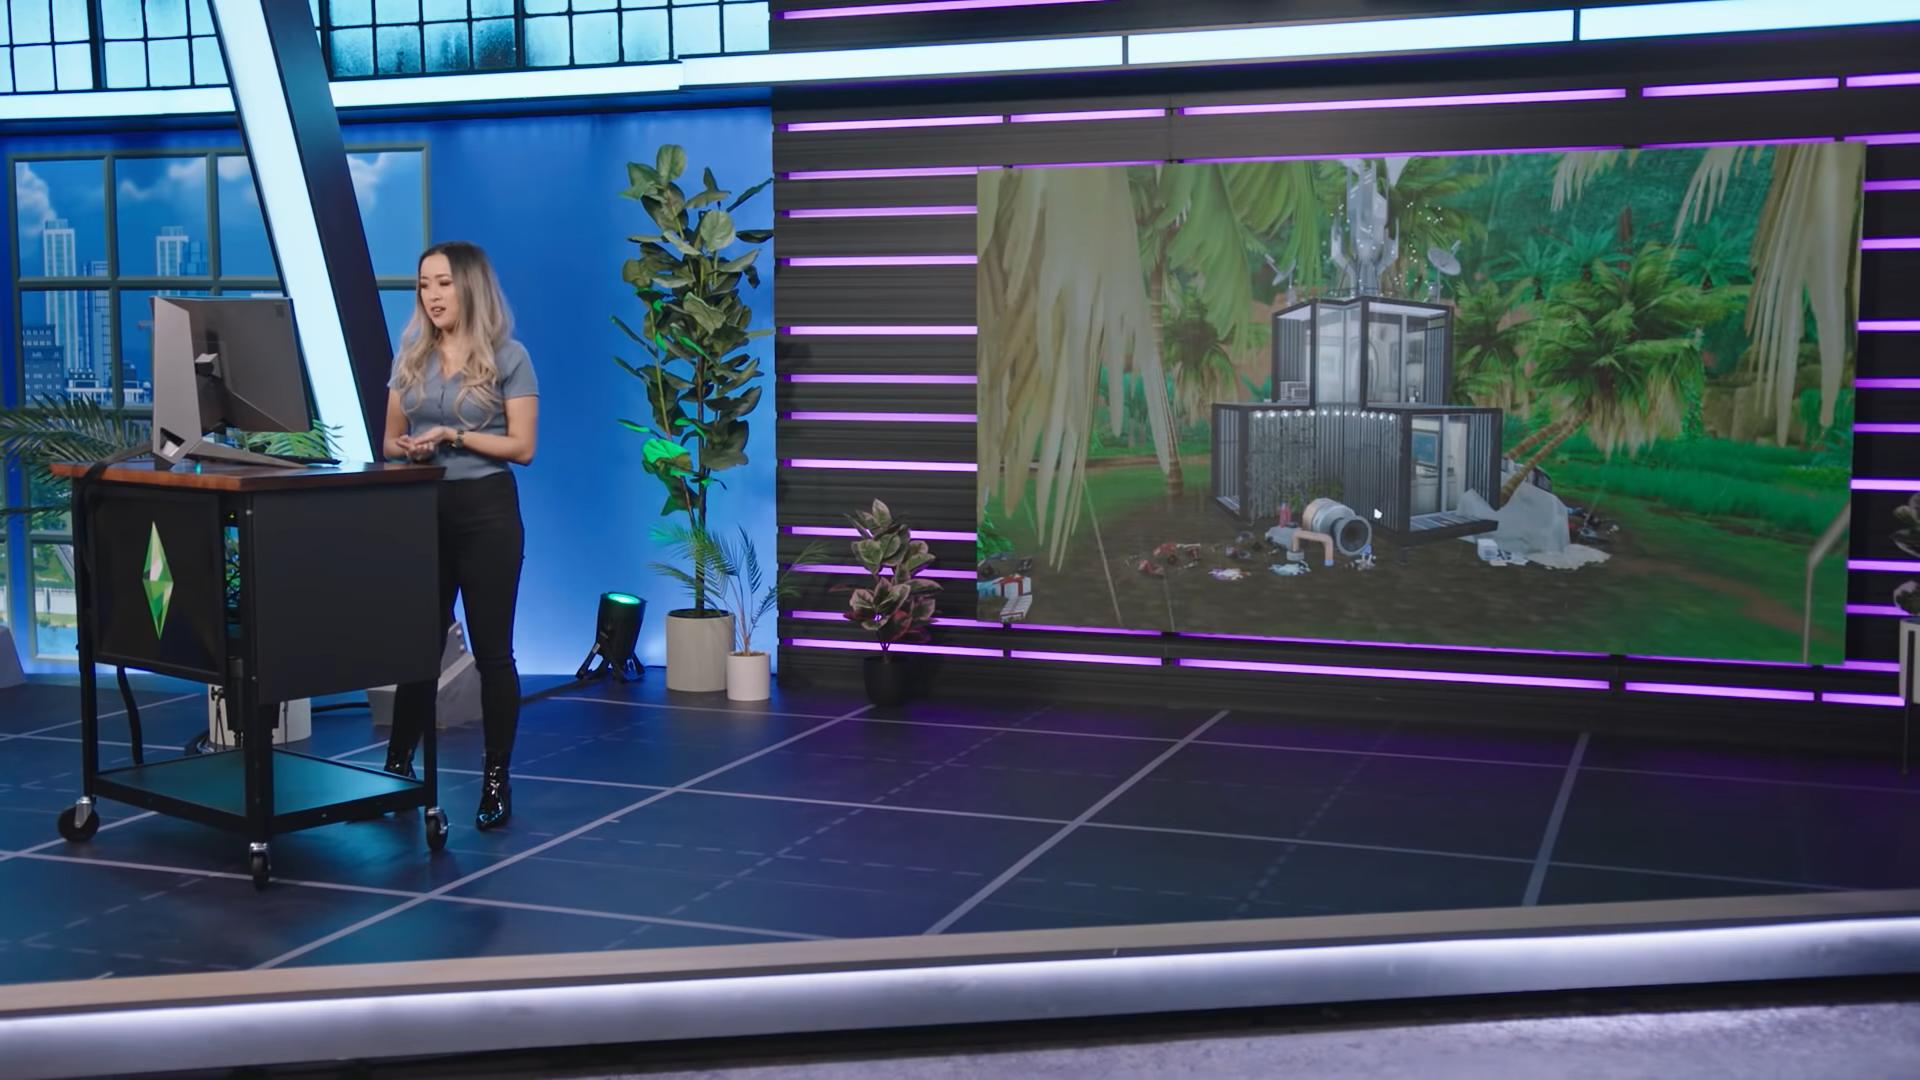 Les Sims Spark'd Screenshot-2020-08-03-175513